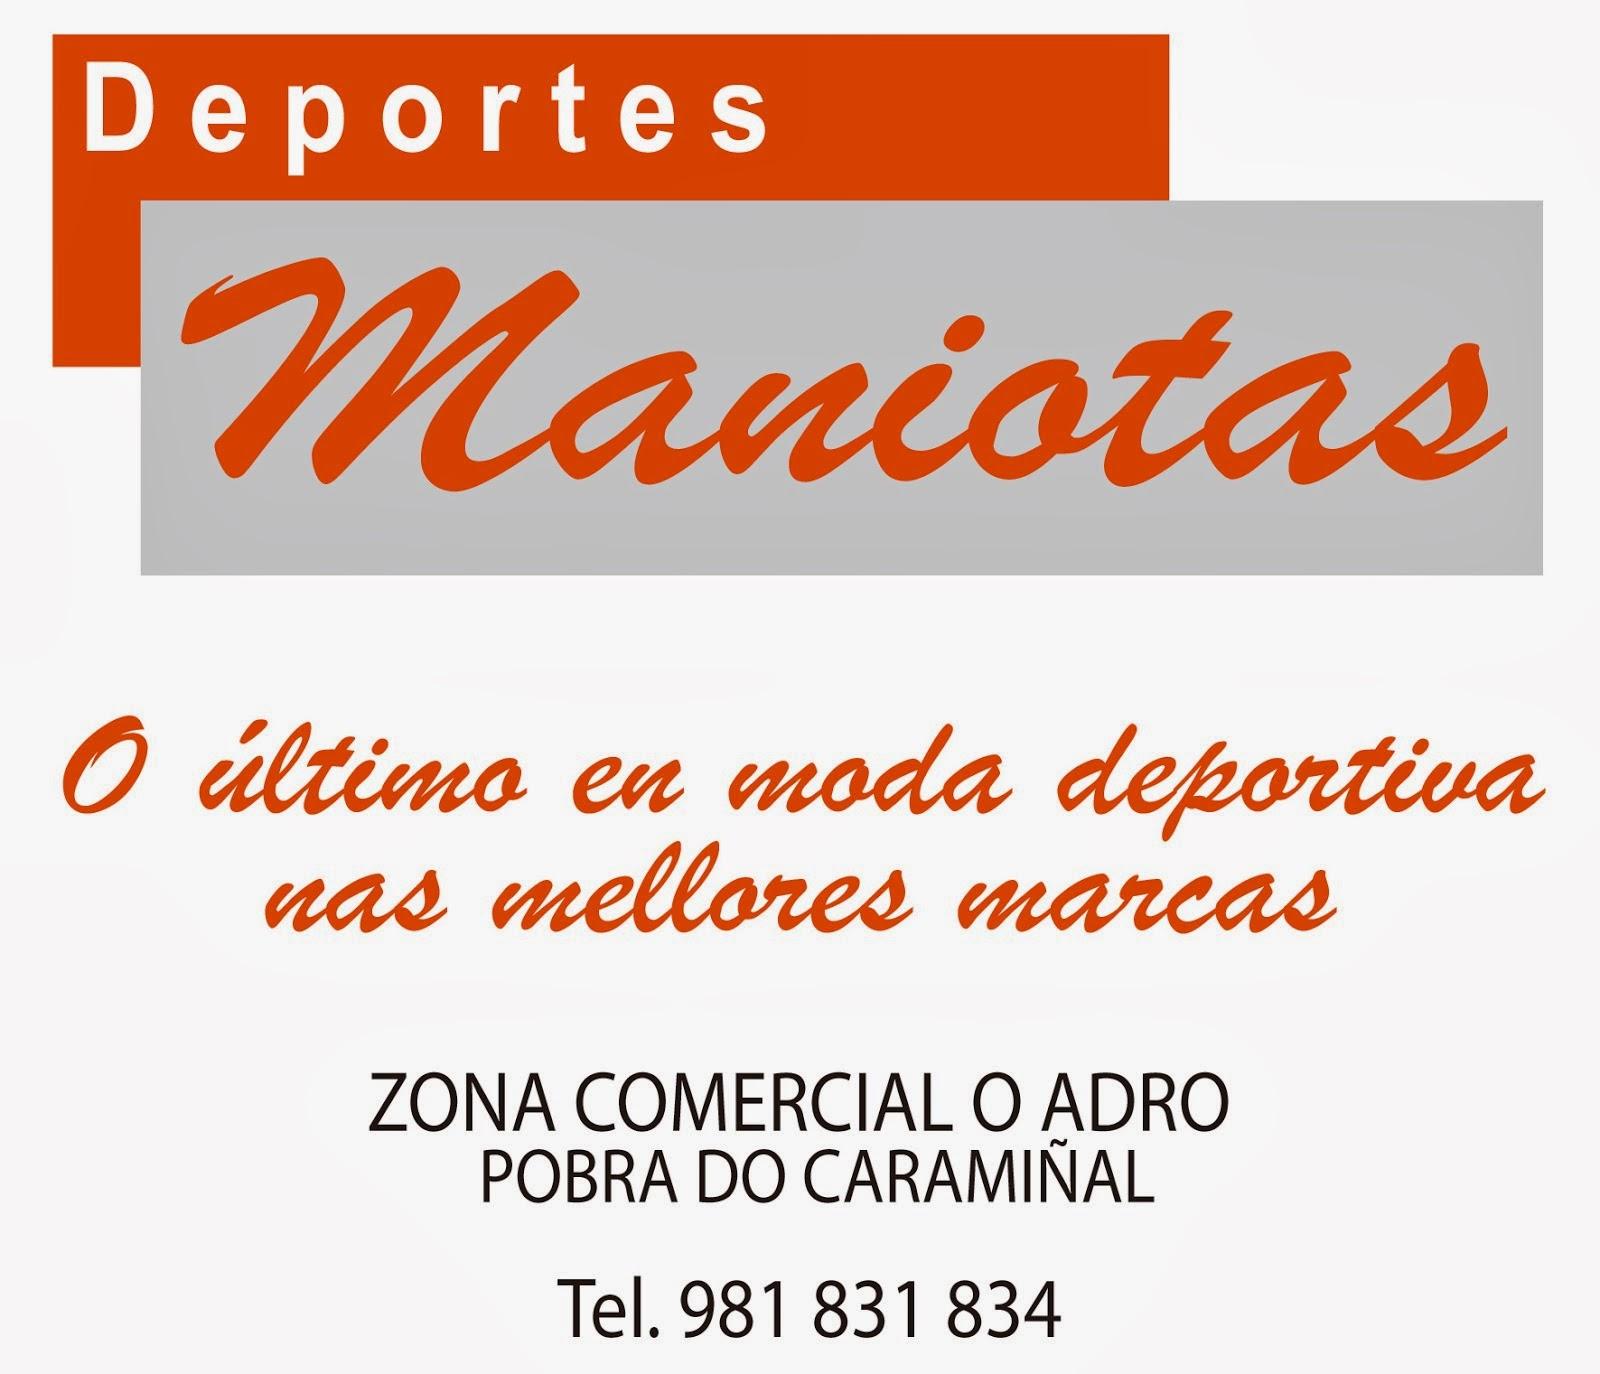 Deportes Maniotas